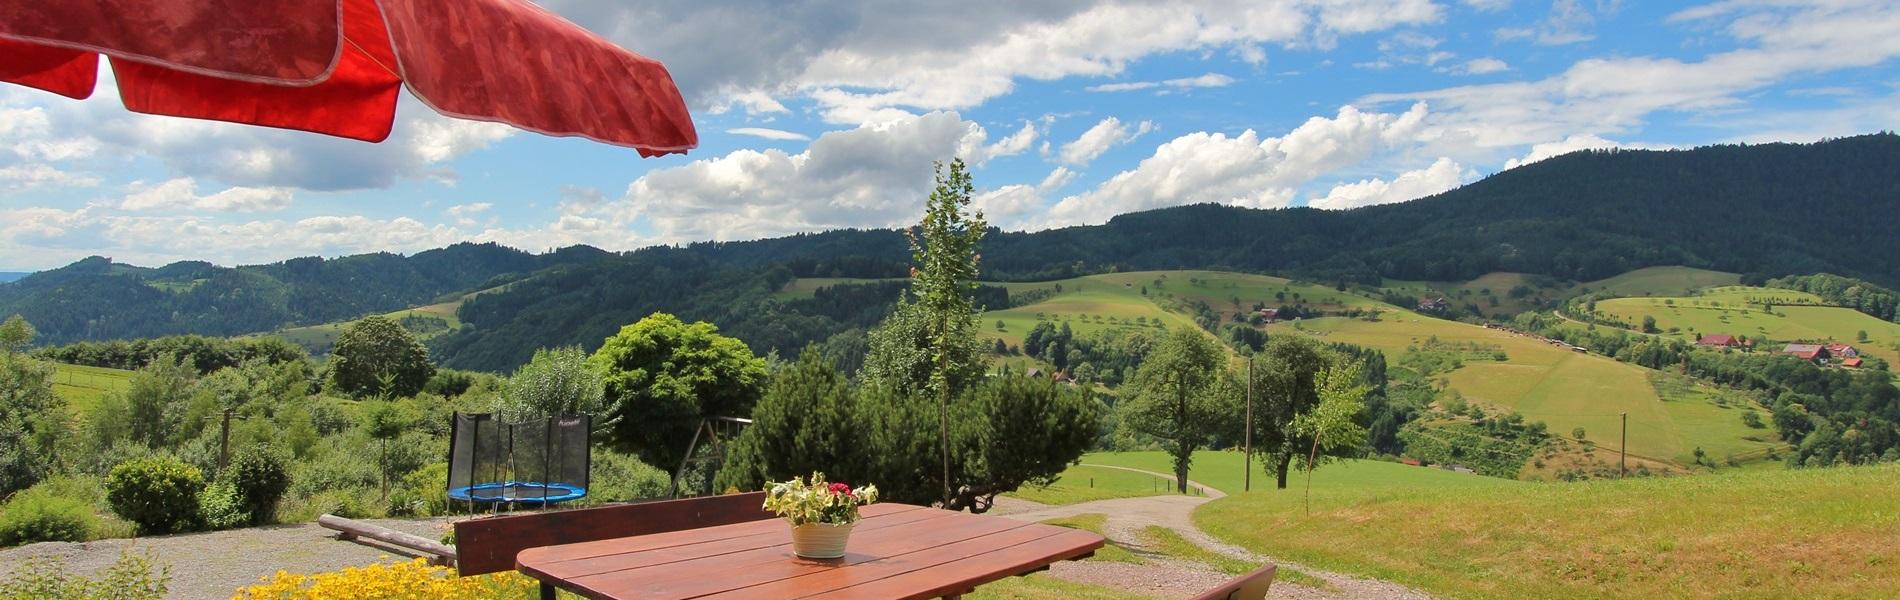 Ausblicke Ferienhaus Hubhof Oberharmersbach